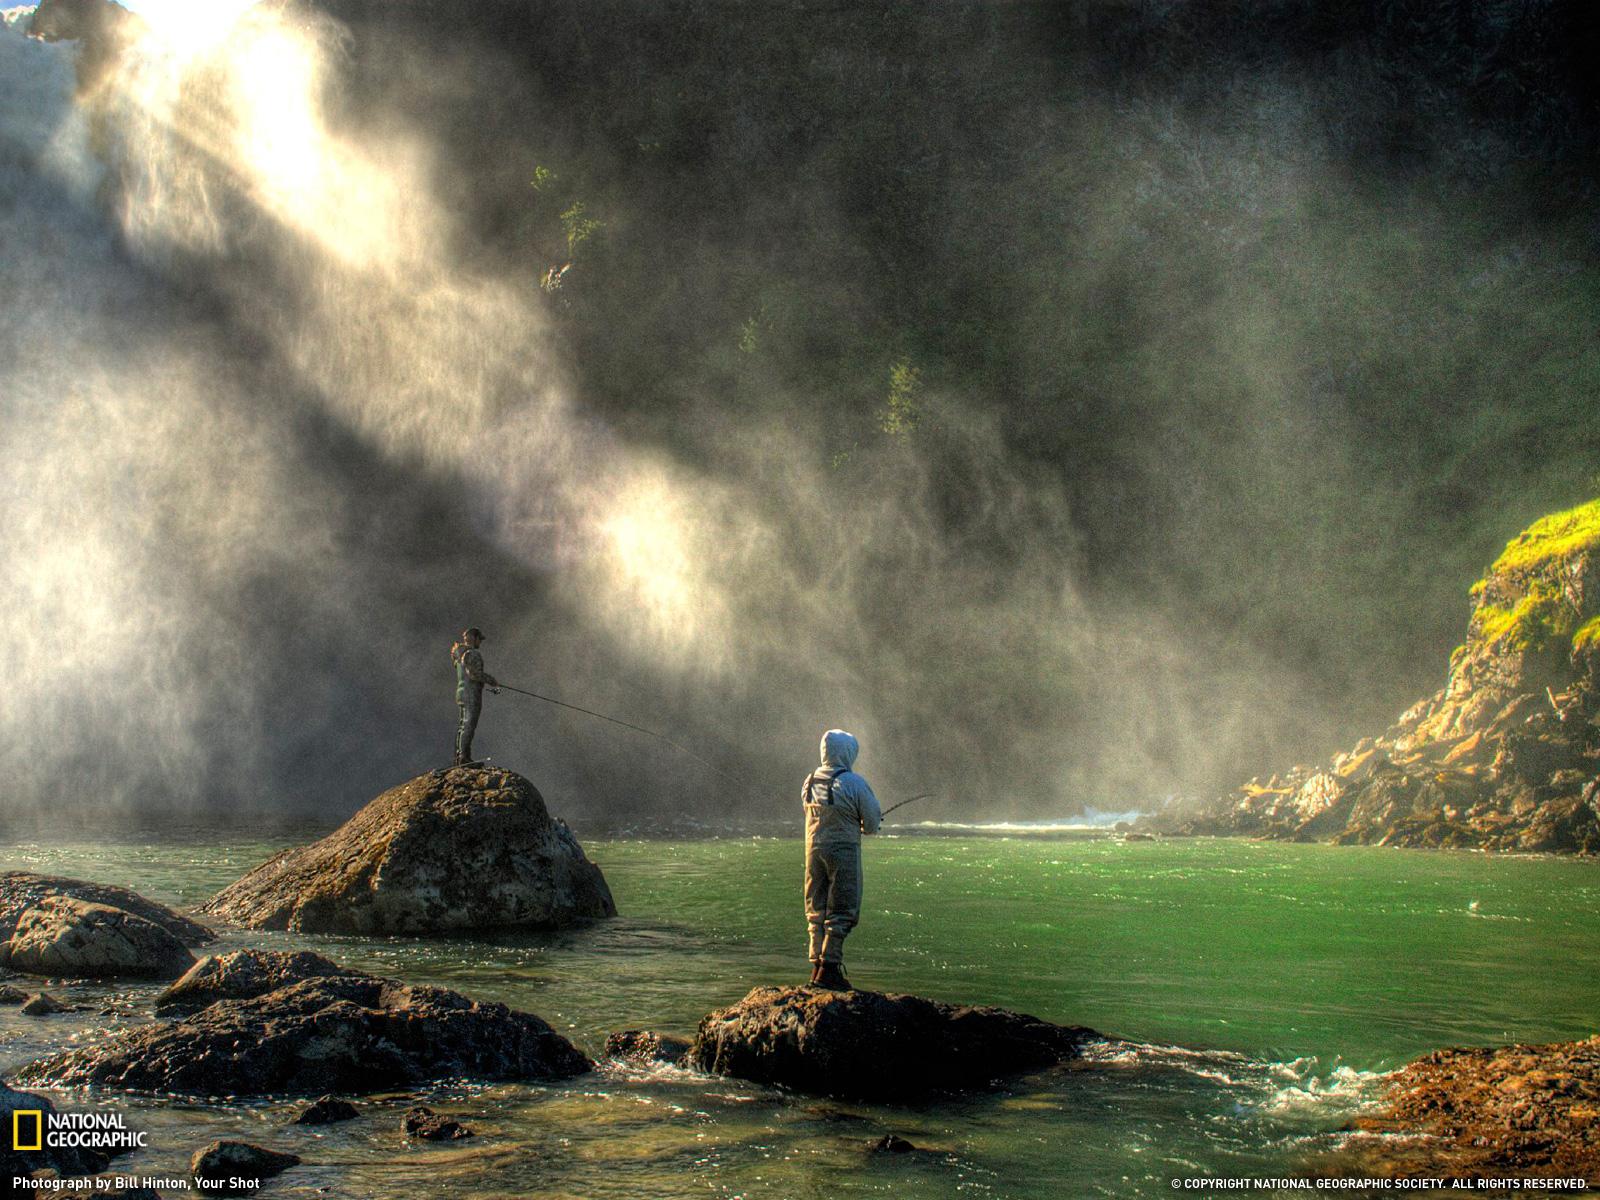 Imagen Hombres Pescando